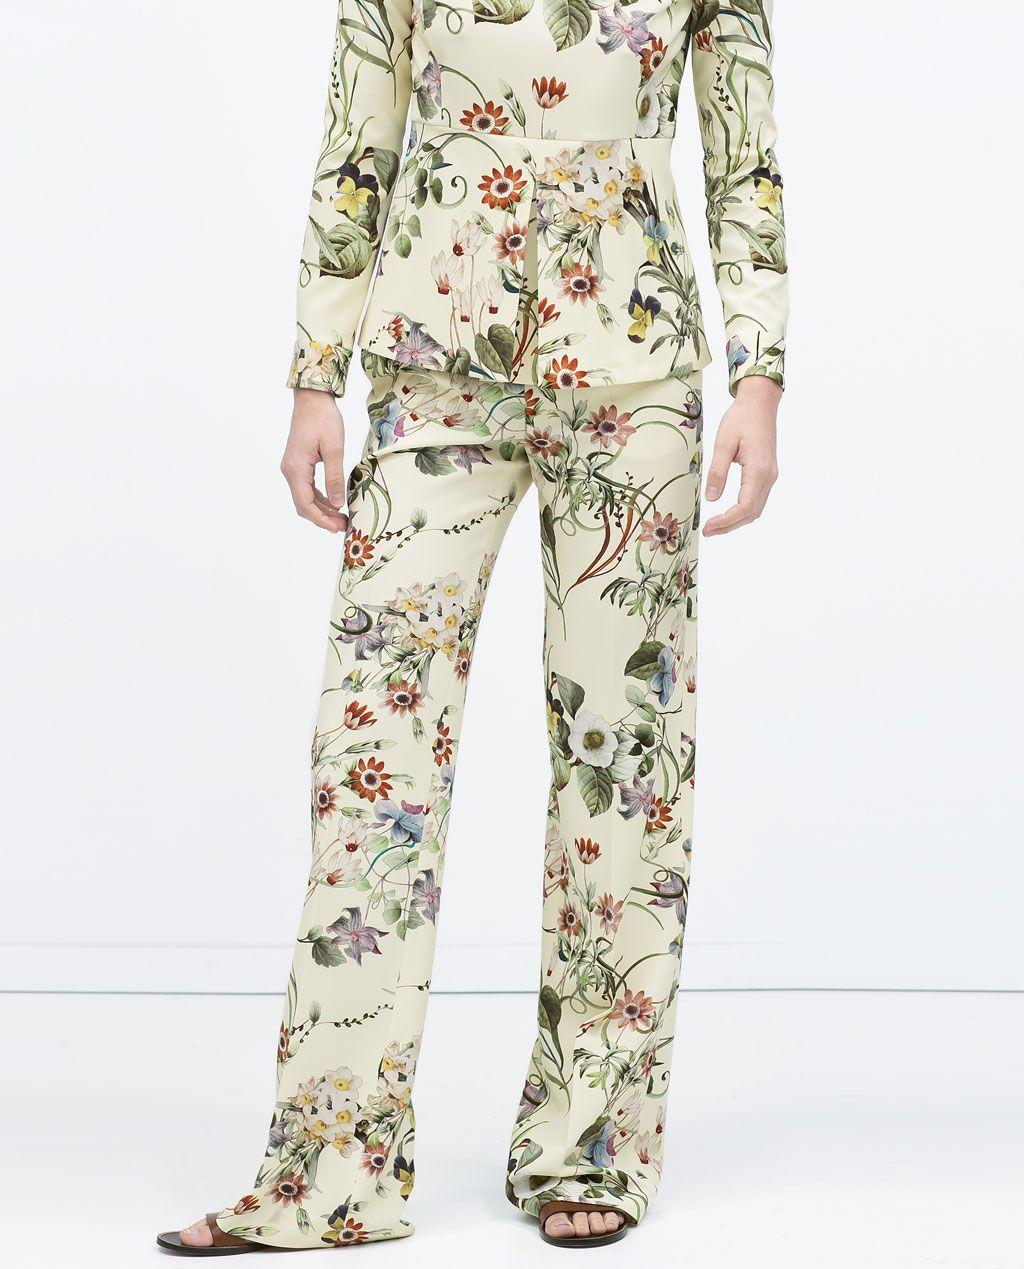 Shirokie Bryuki S Cvetochnym Printom Spring Zhenshiny Lookbook Hosen Frauen Weite Hosen Bedruckte Hosen